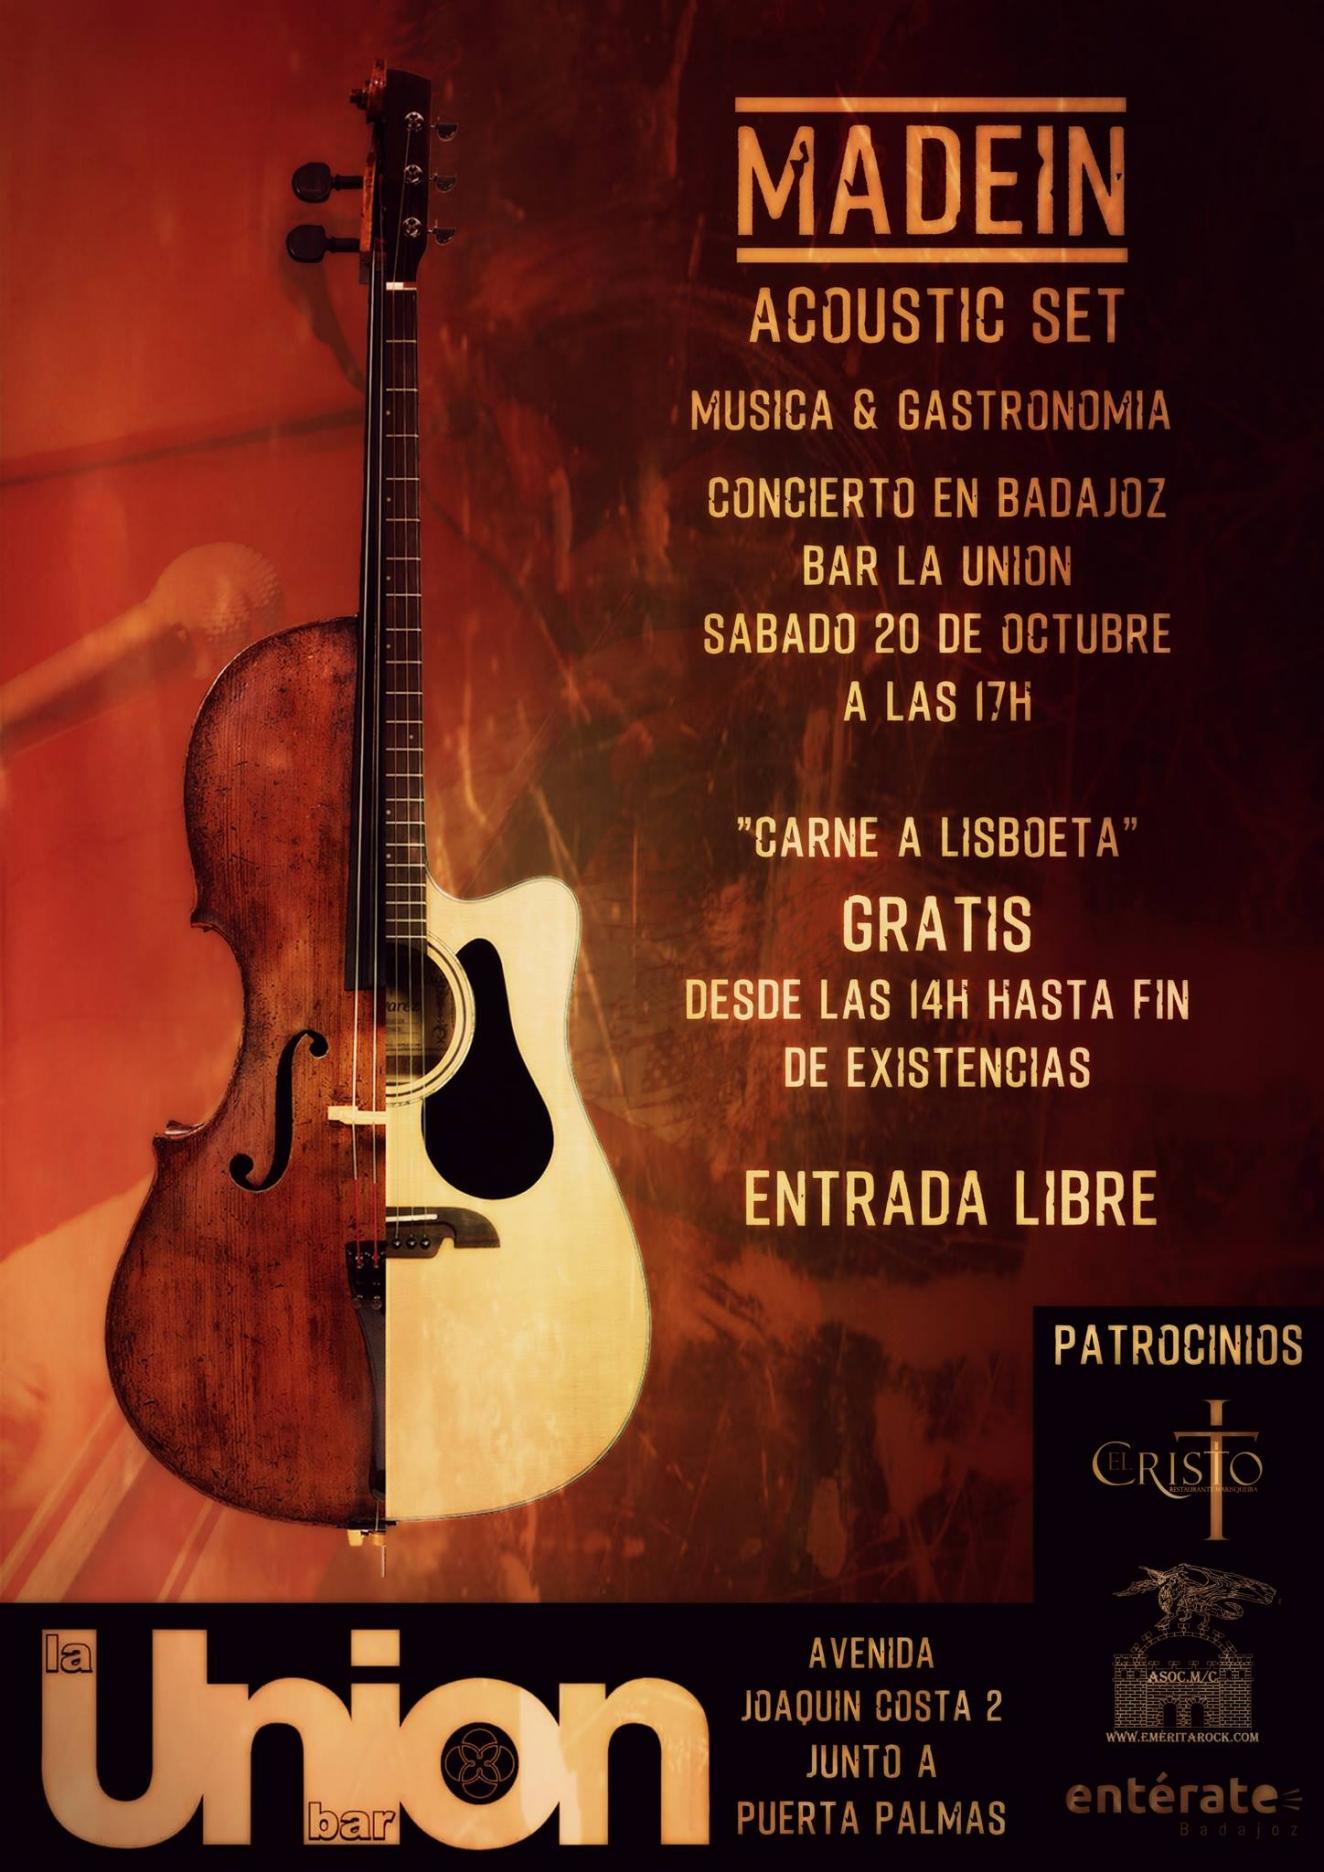 MadeIN Acoustic Set